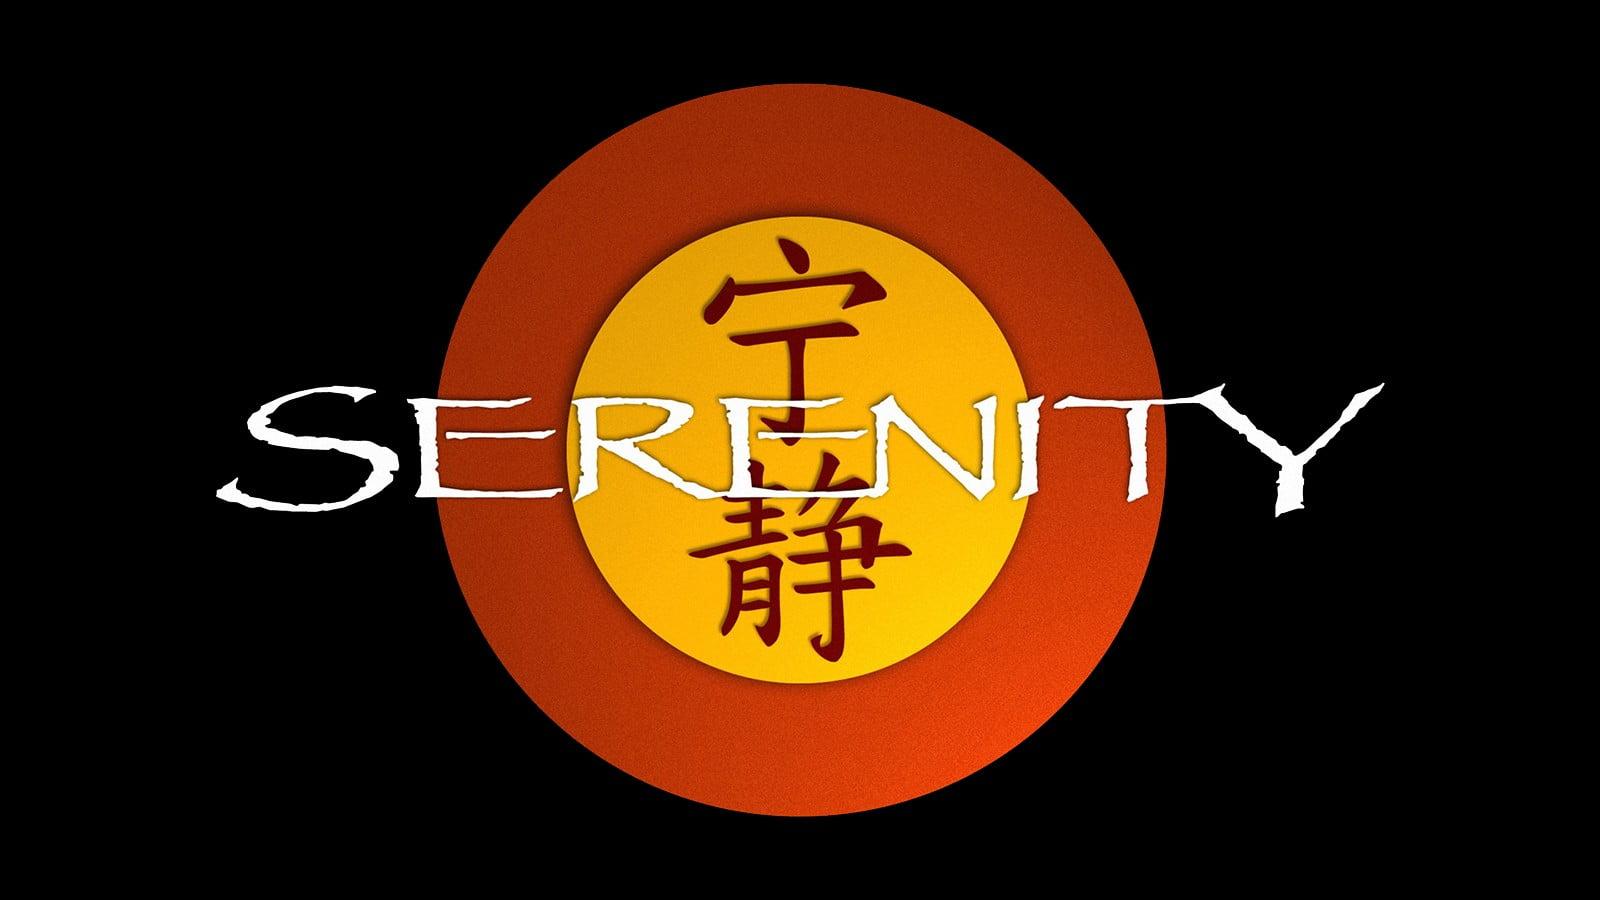 Serenity logo, Serenity, Firefly HD wallpaper.